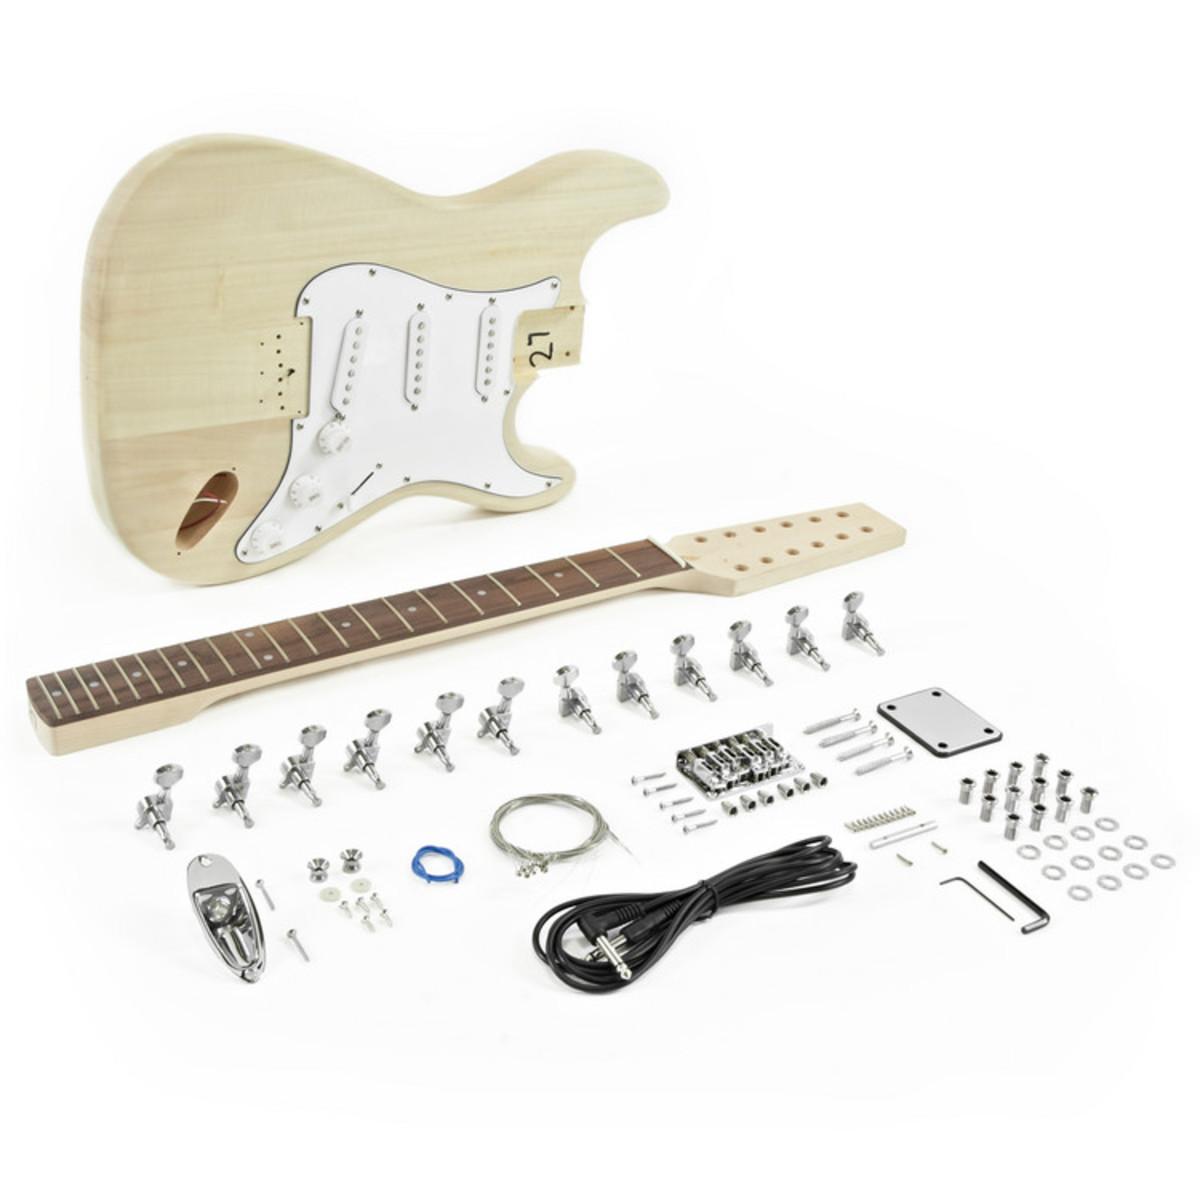 Image of 12 String LA Electric Guitar DIY Kit